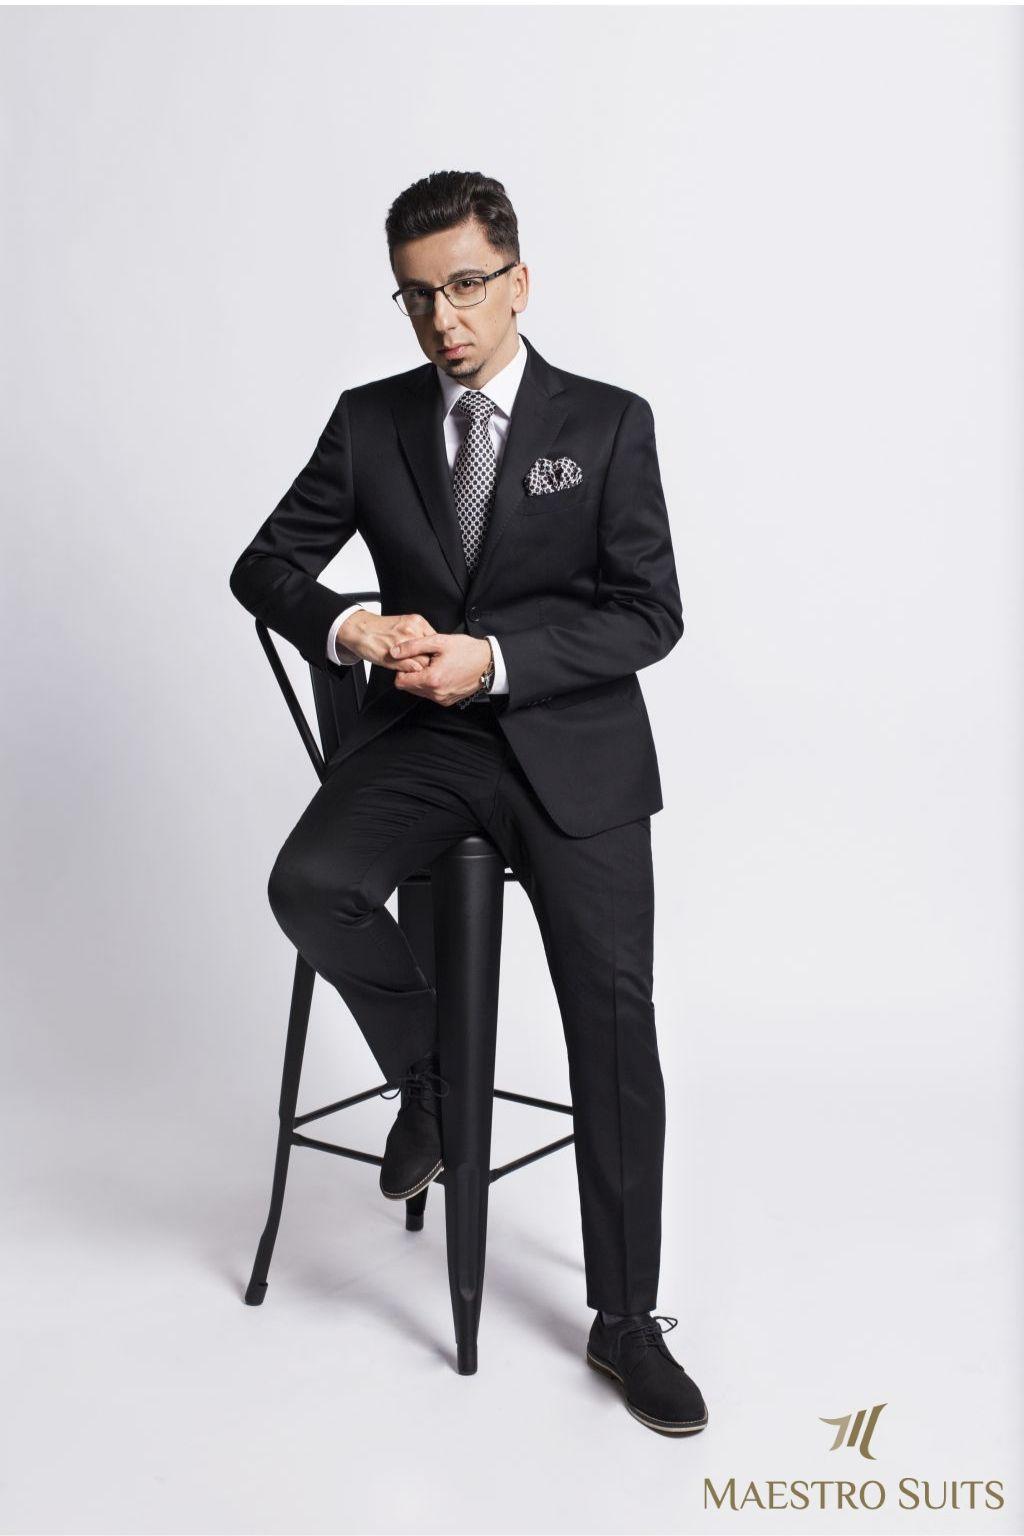 zvonko_komsic_maestro_suits (7)